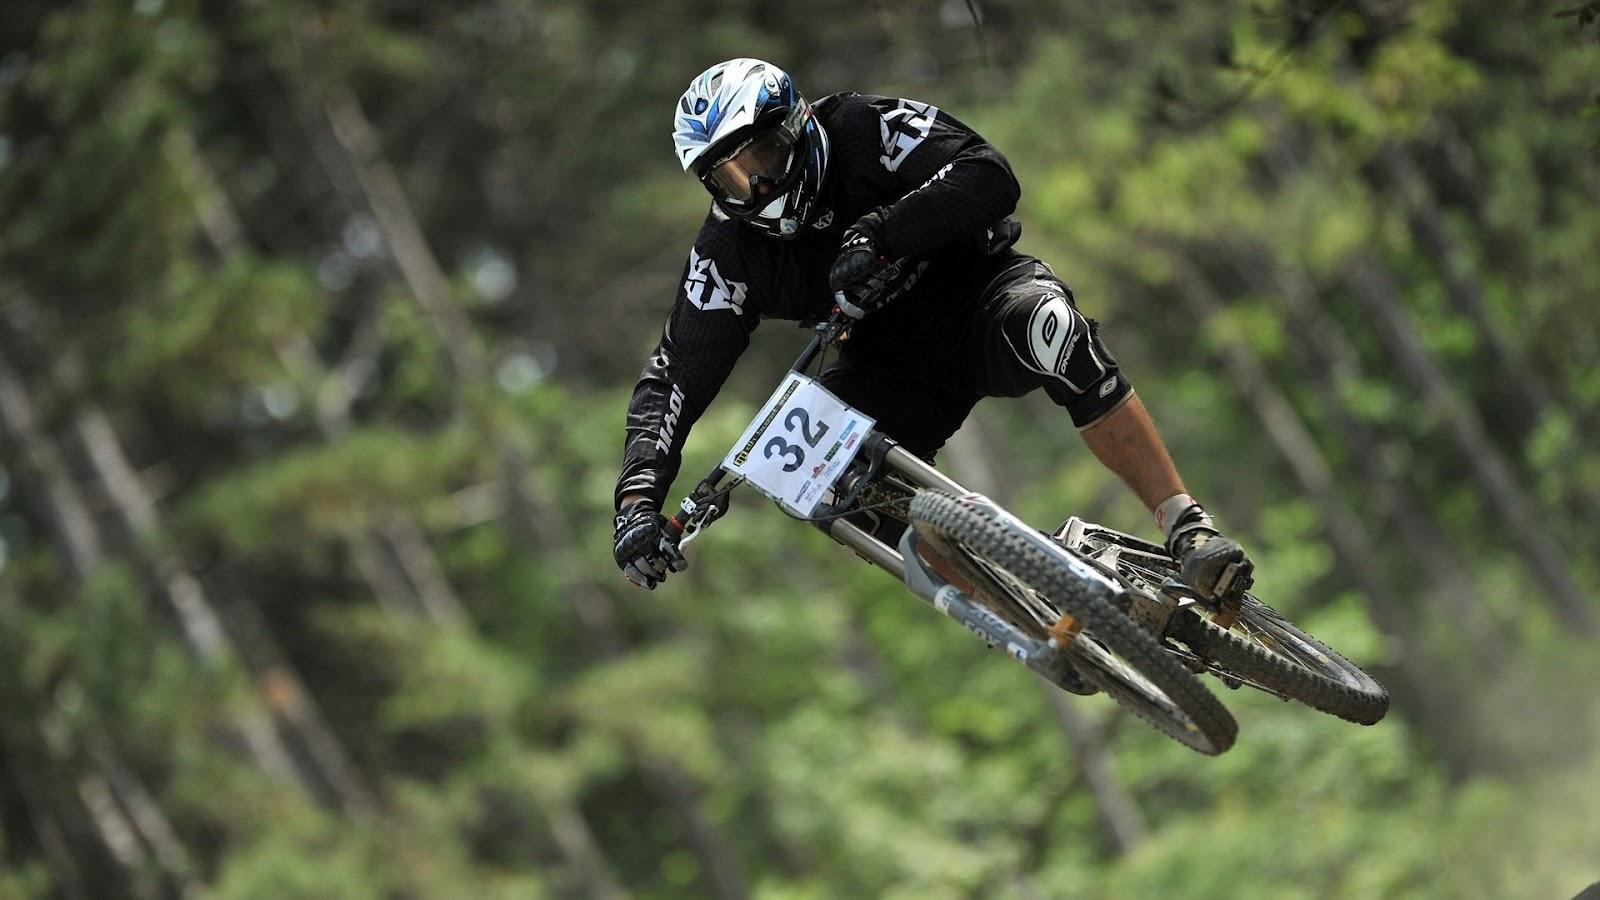 HD Wallpapers: Bike Stunt...